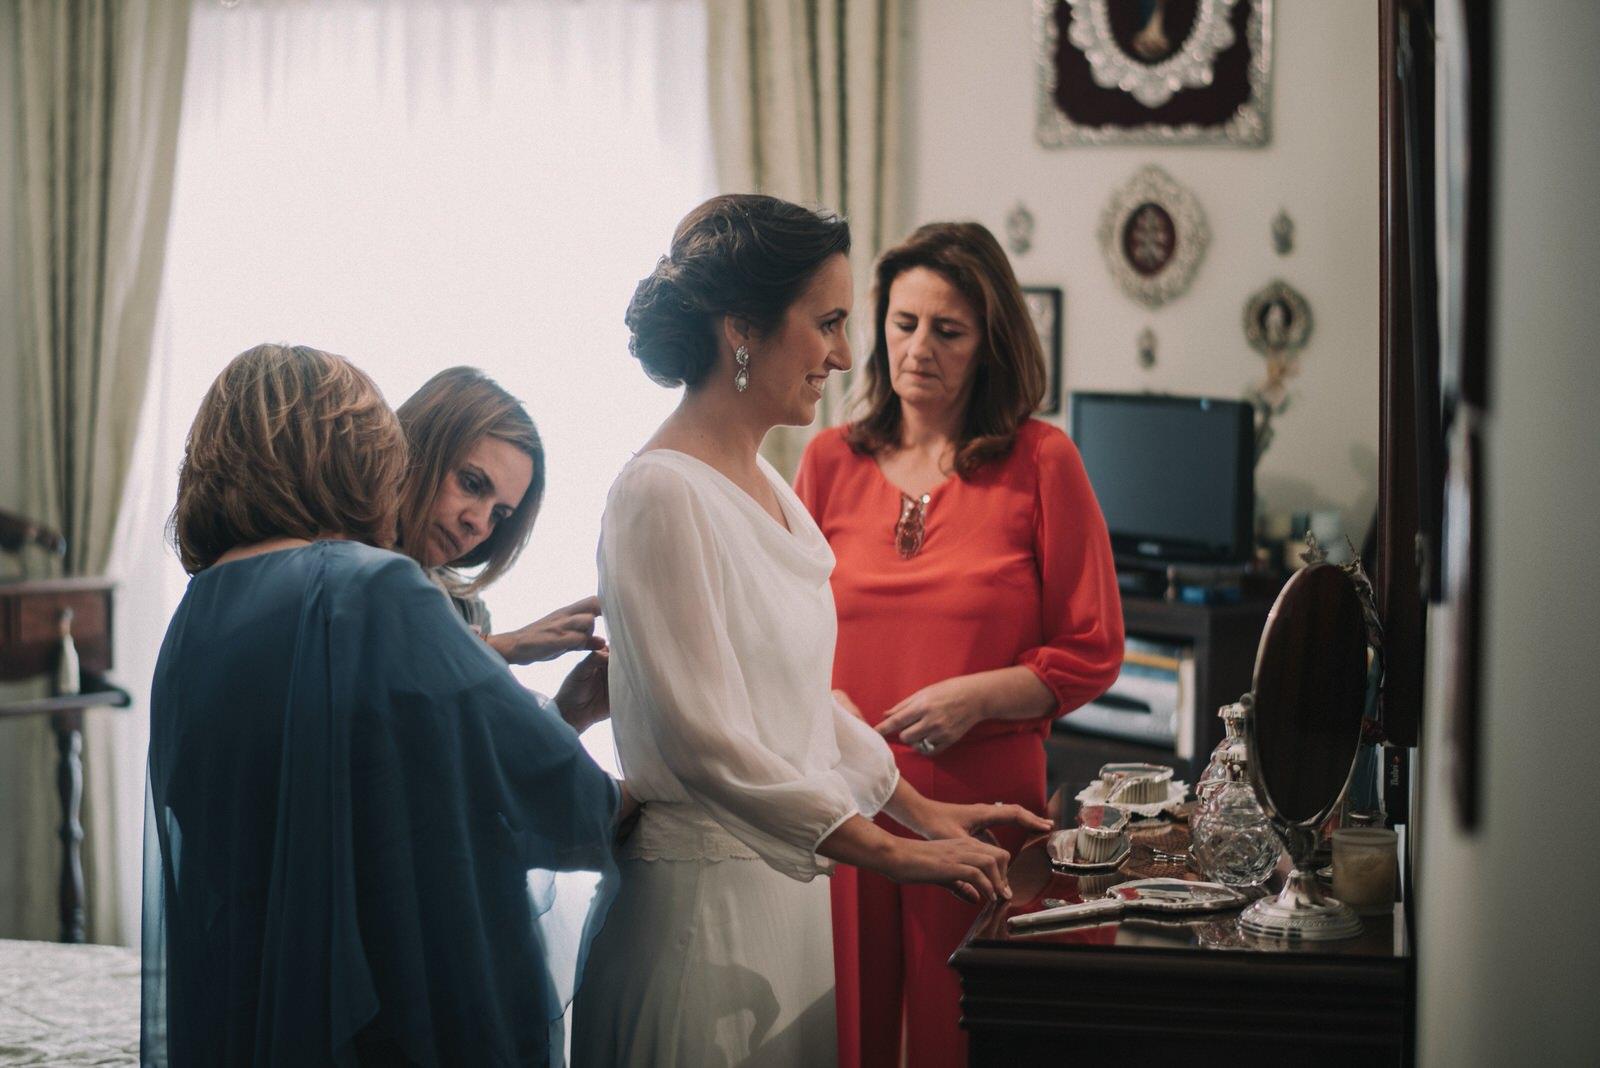 fotografo de bodas sevilla - fotografo boda - fotografía sevilla - Andrés AmarilloAAA_4324- tele- fine.JPG